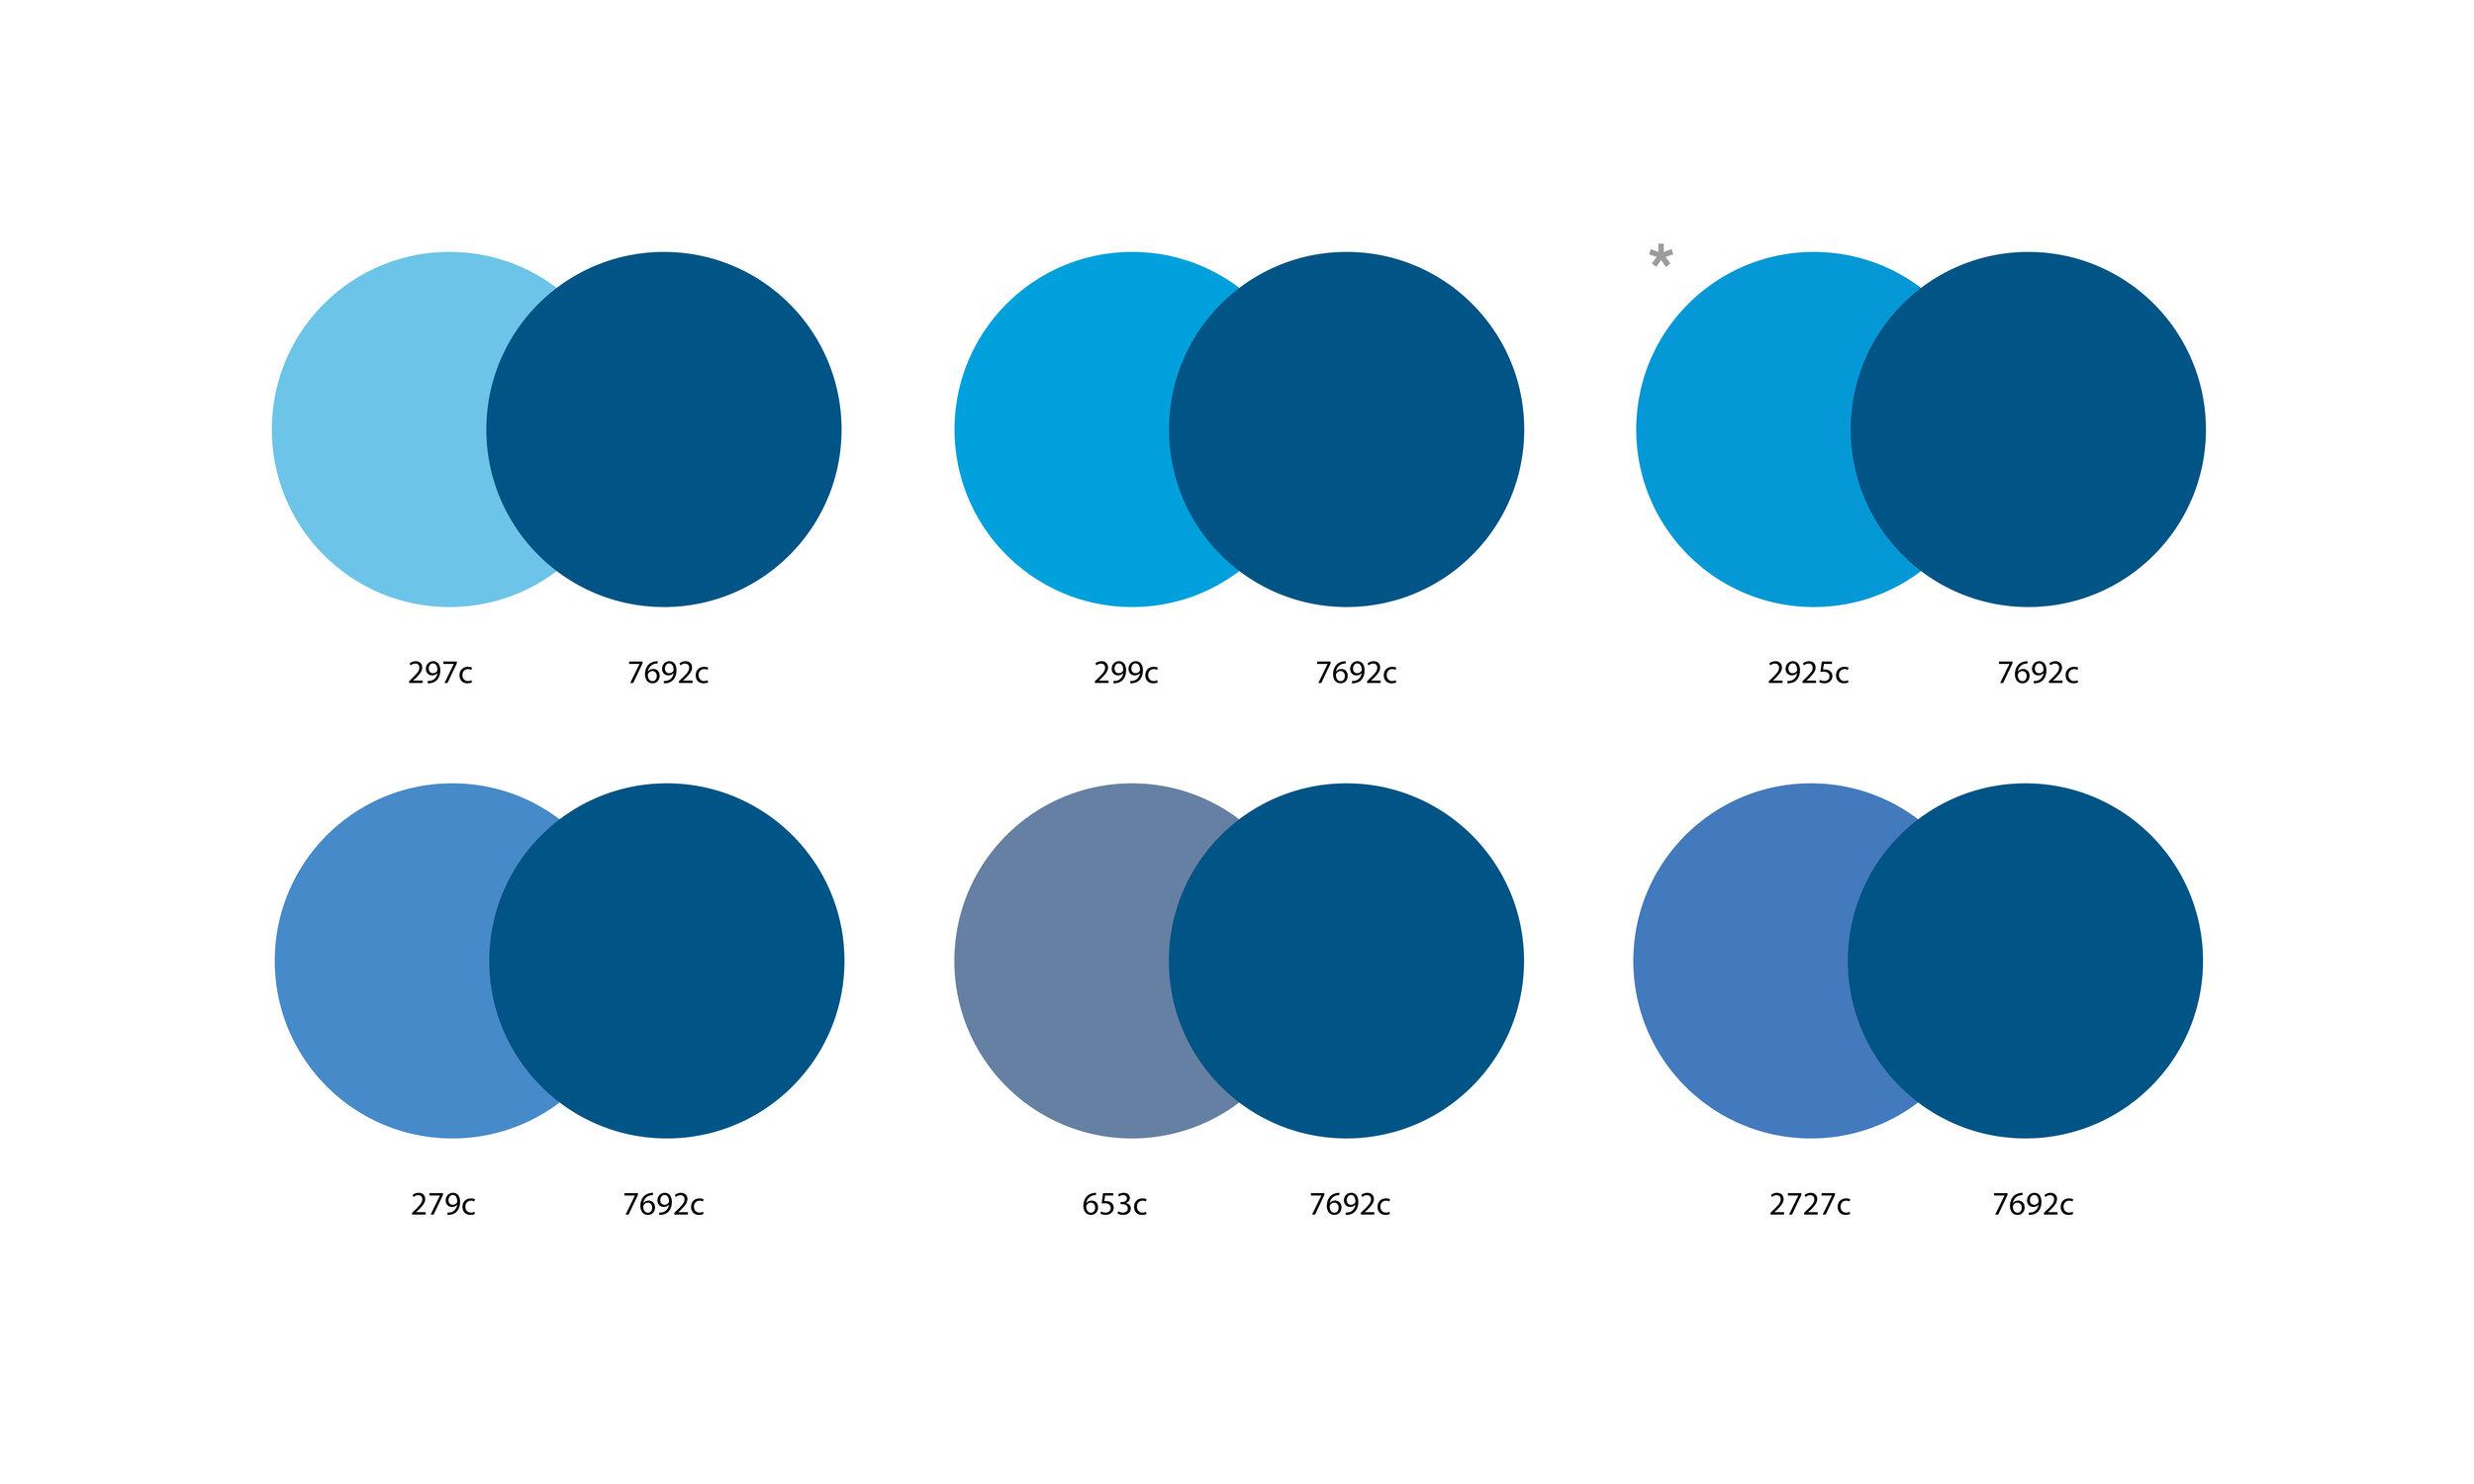 apparel-company-brand-identity-refresh-design-by-jordan-fretz-design-1.jpg